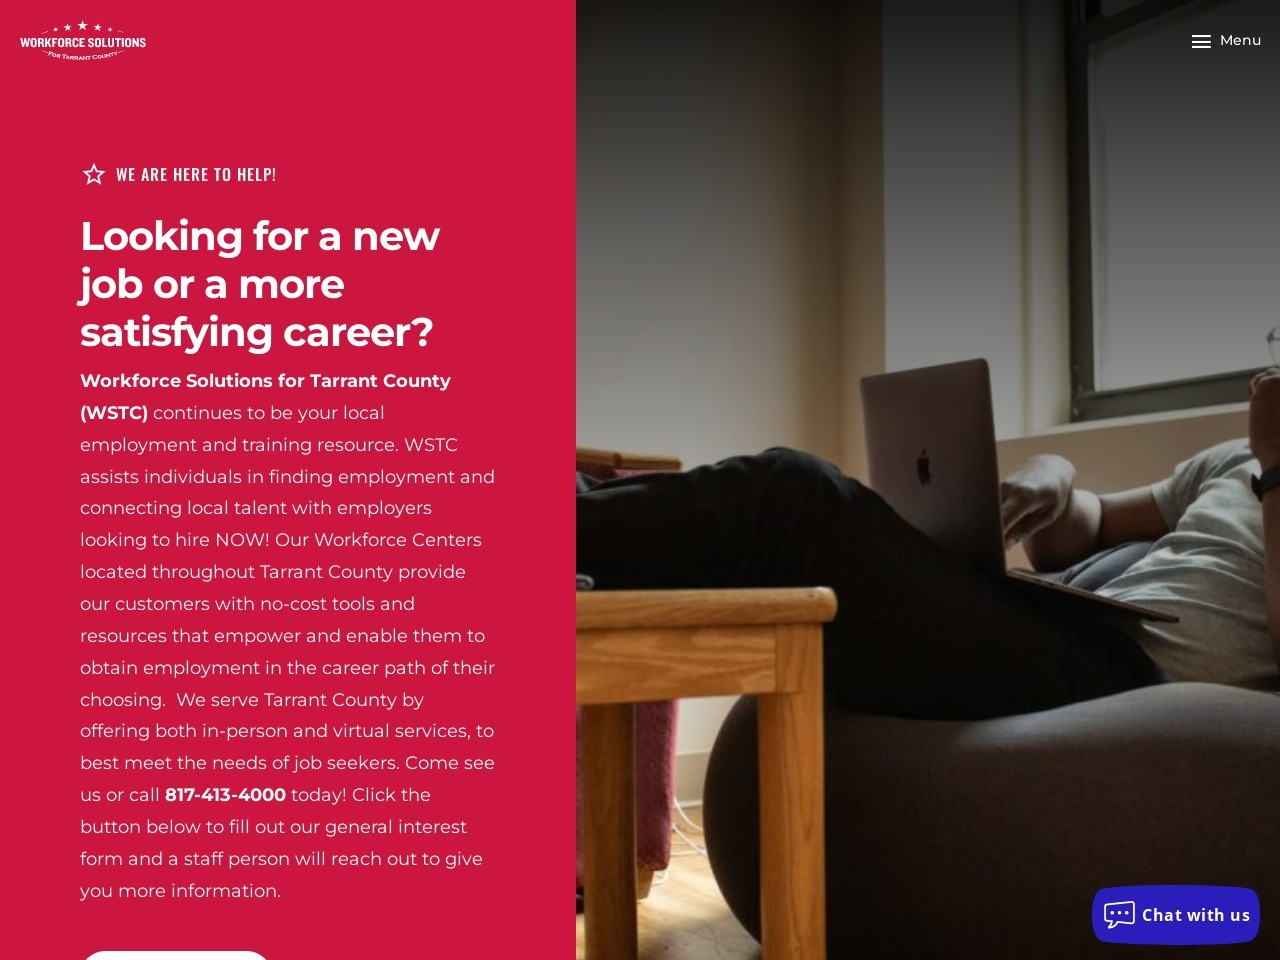 workforcesolutions.net